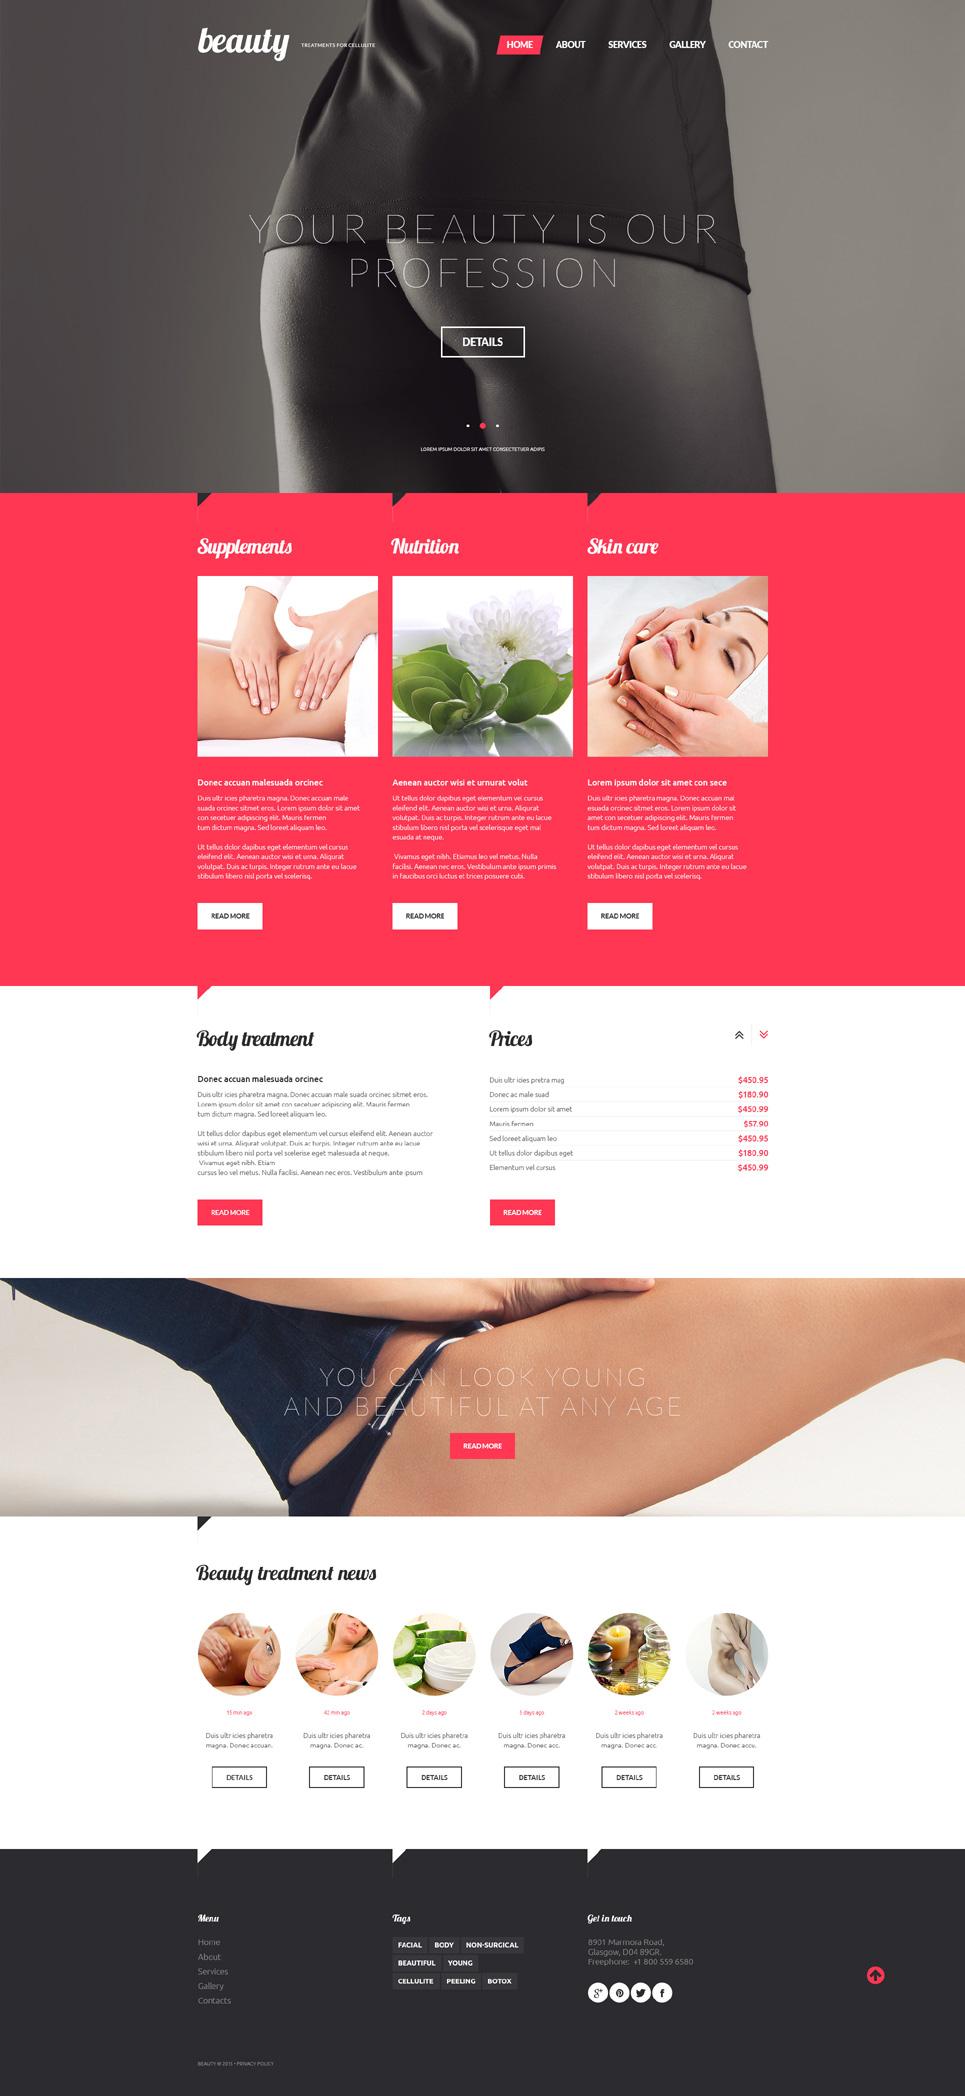 Treatments for Celulite template illustration image